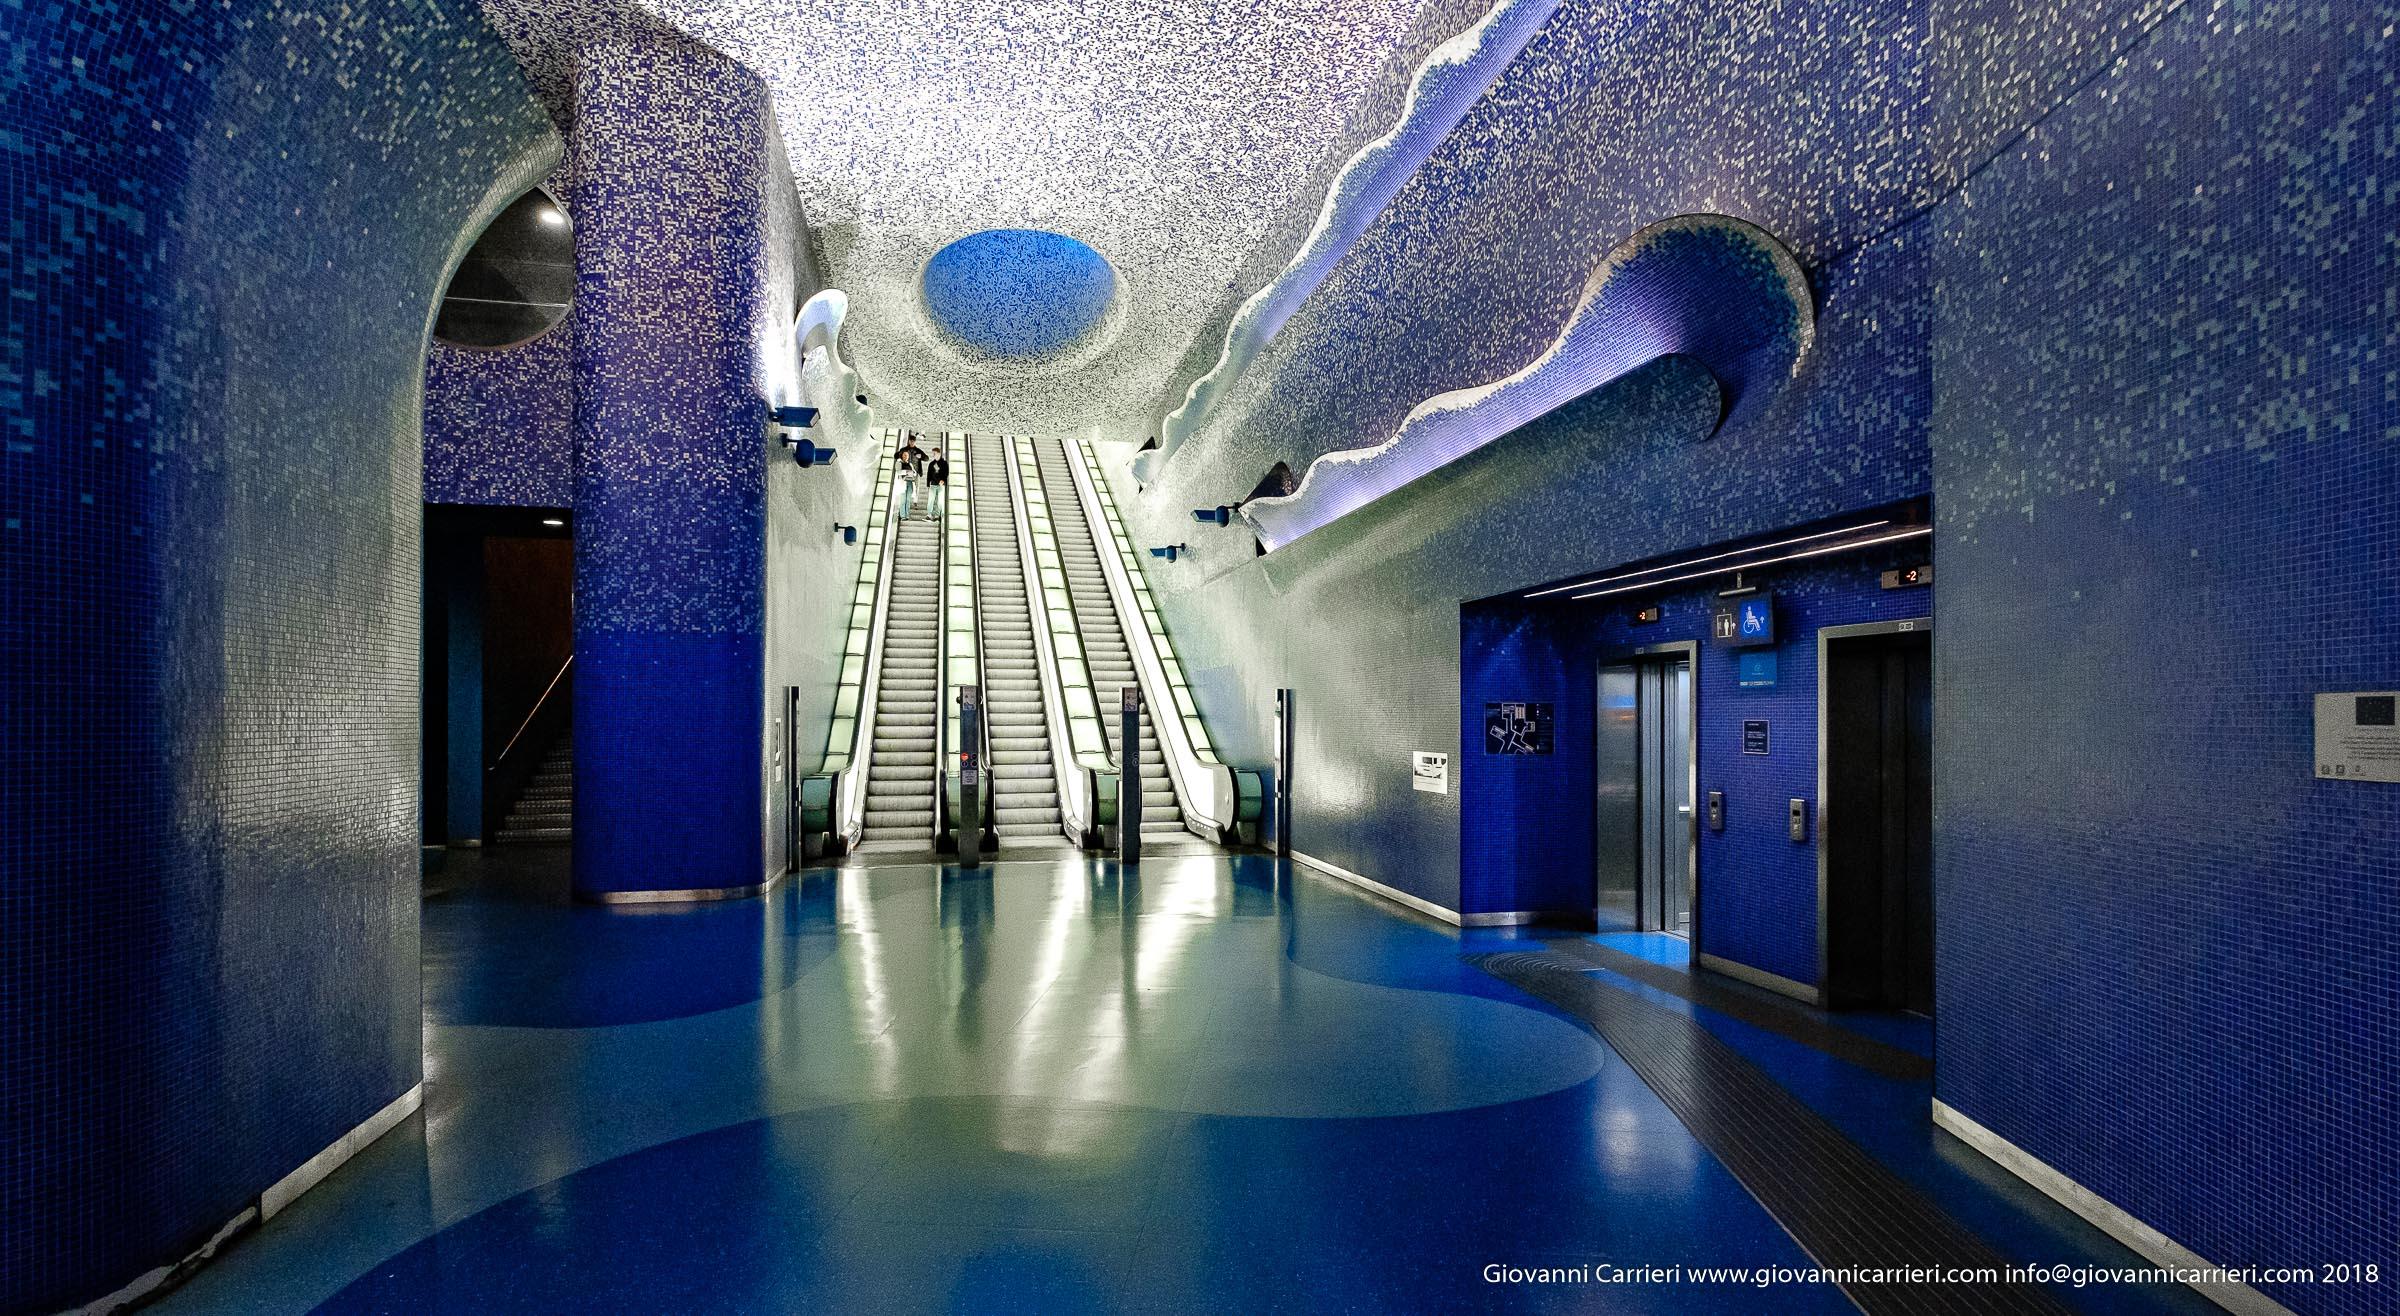 The revolving stairs of the Toledo underground stop